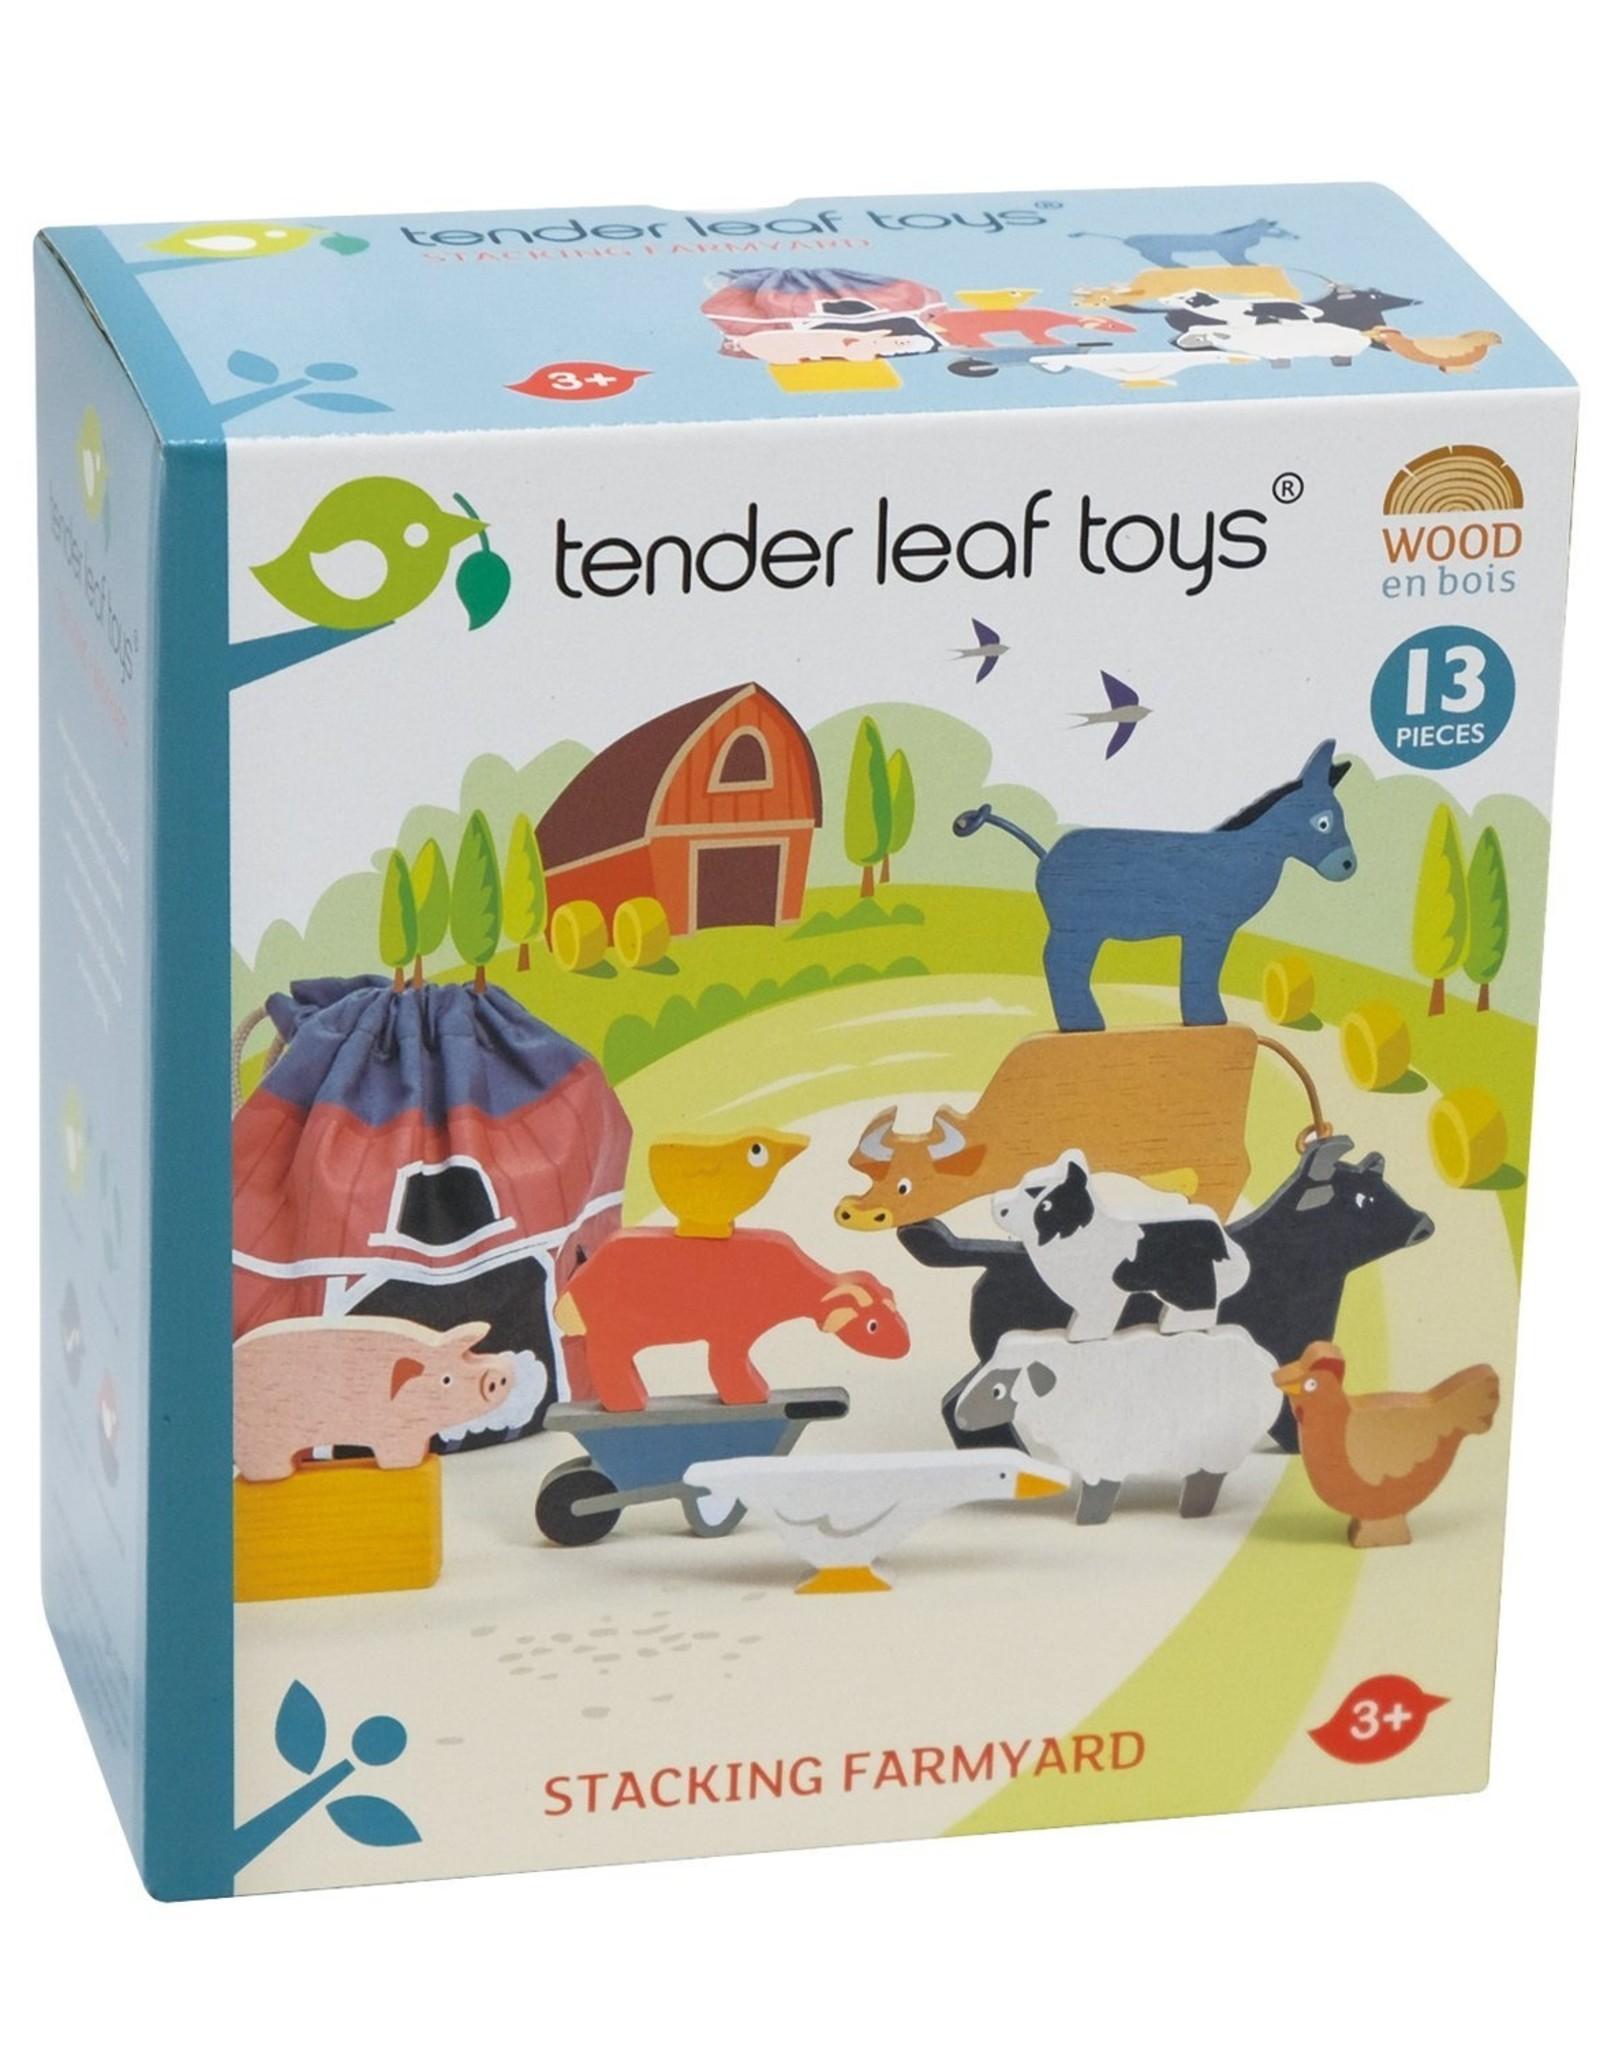 Tender leaf toys Stacking Farmyard